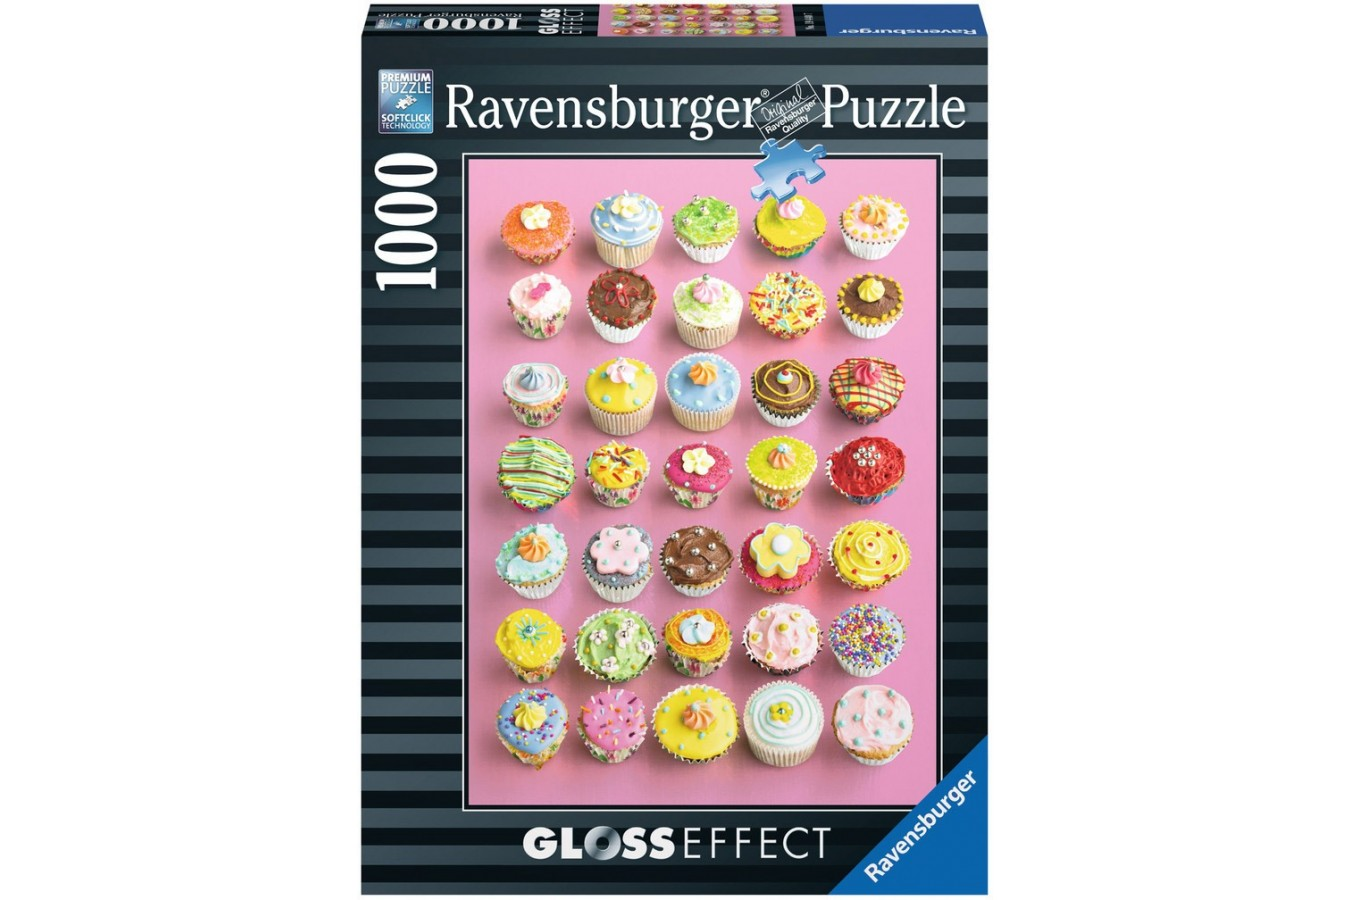 Puzzle Ravensburger - Howard Shooter: Prajiturele, 1.000 piese (19440)